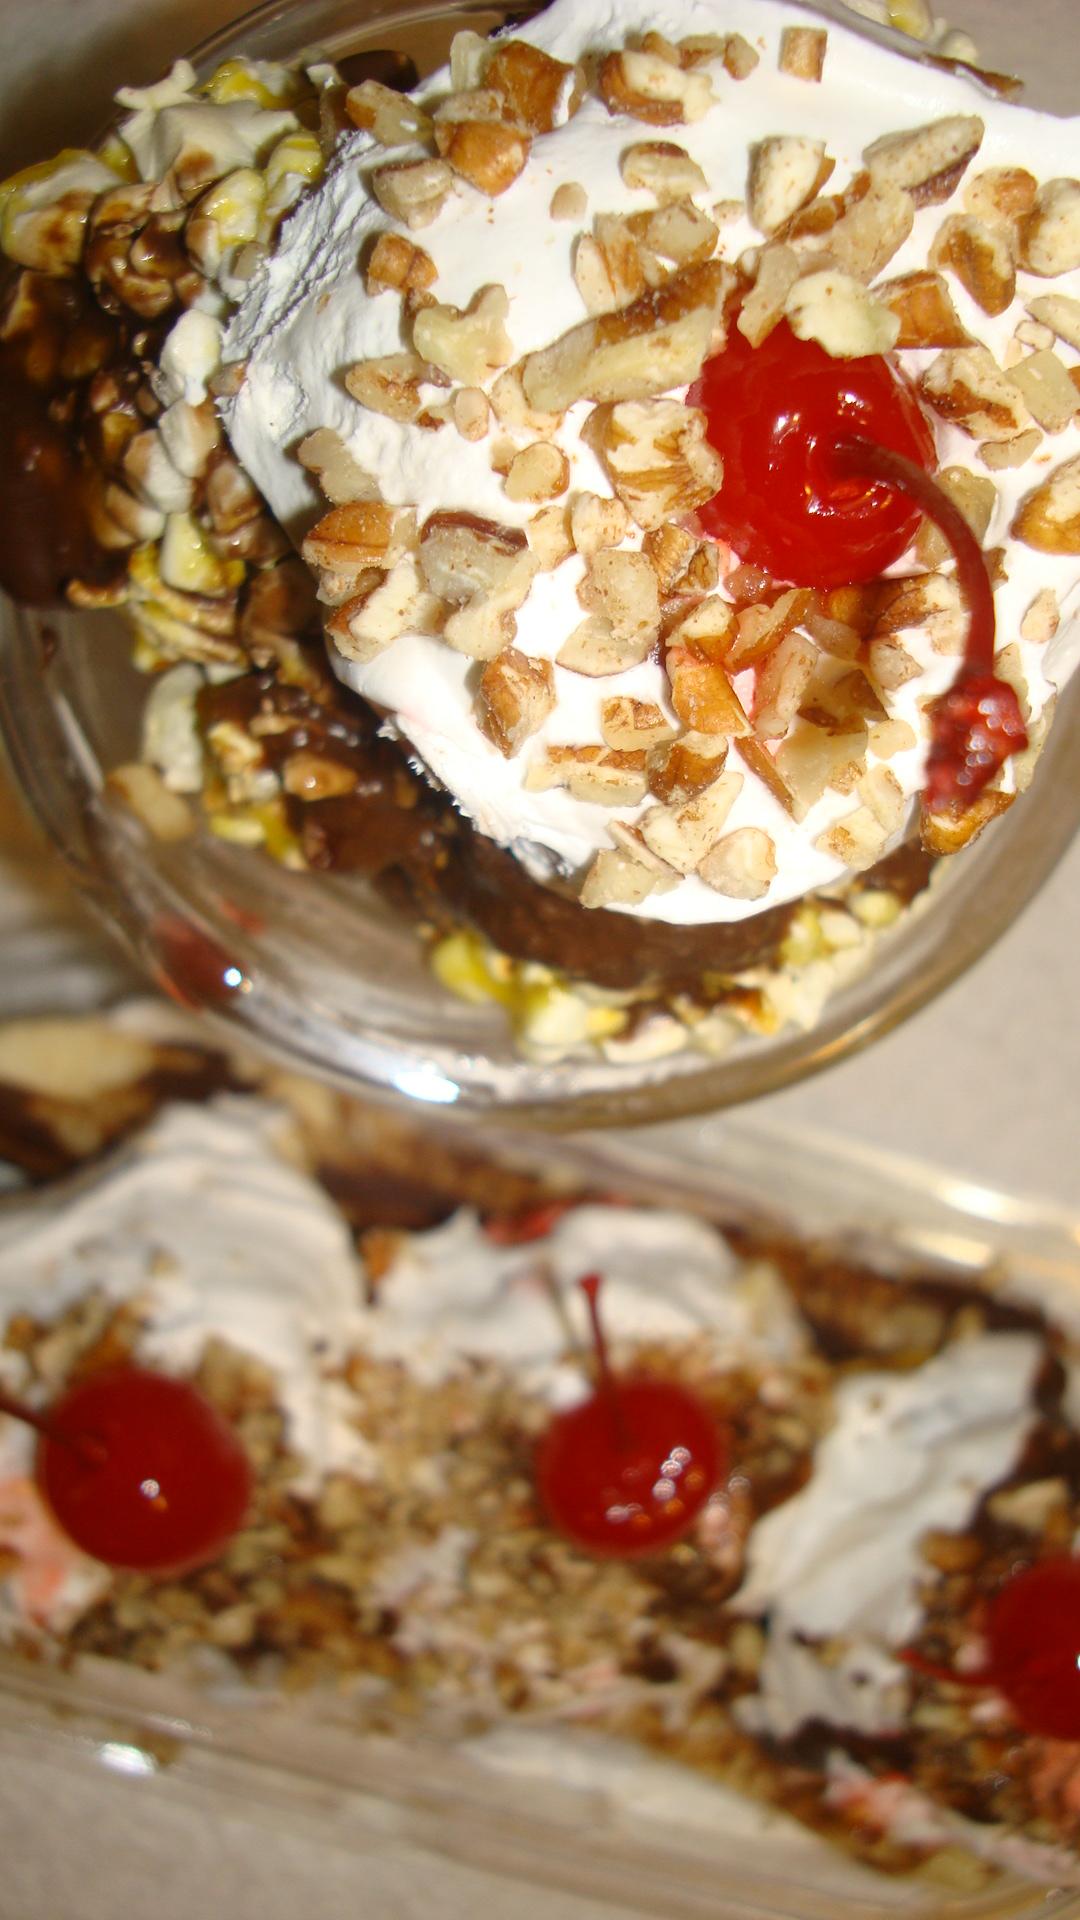 No Melt Microwave Popcorn Ice Cream Treats